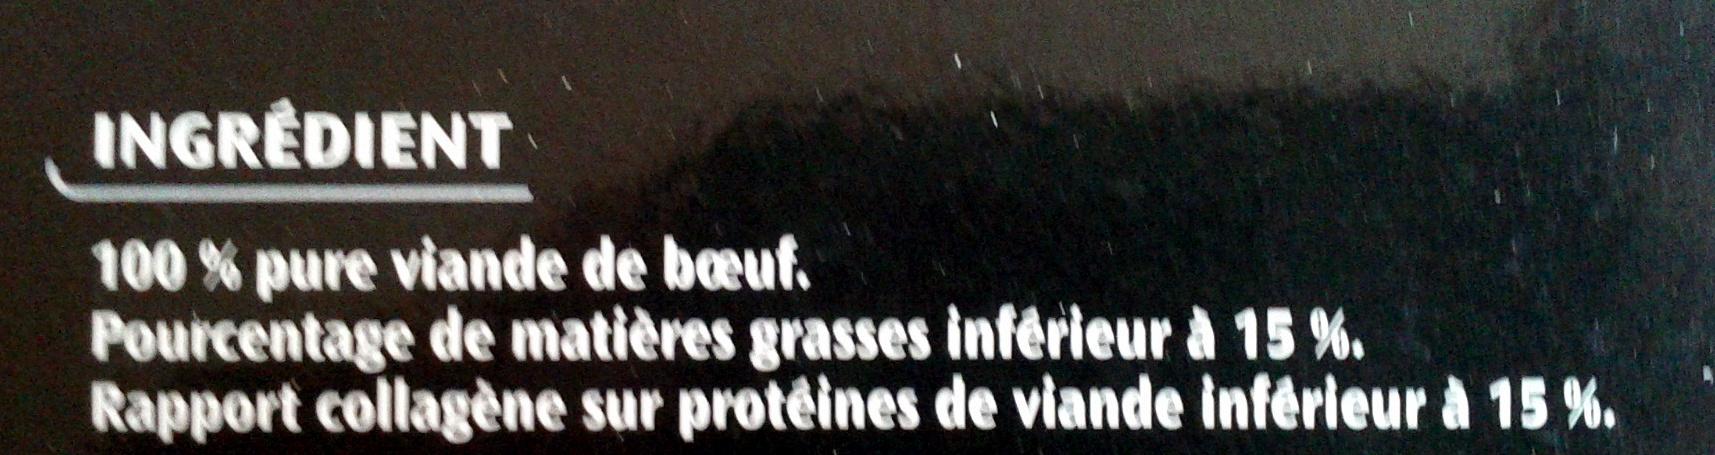 Le Pur Bœuf - Ingrediënten